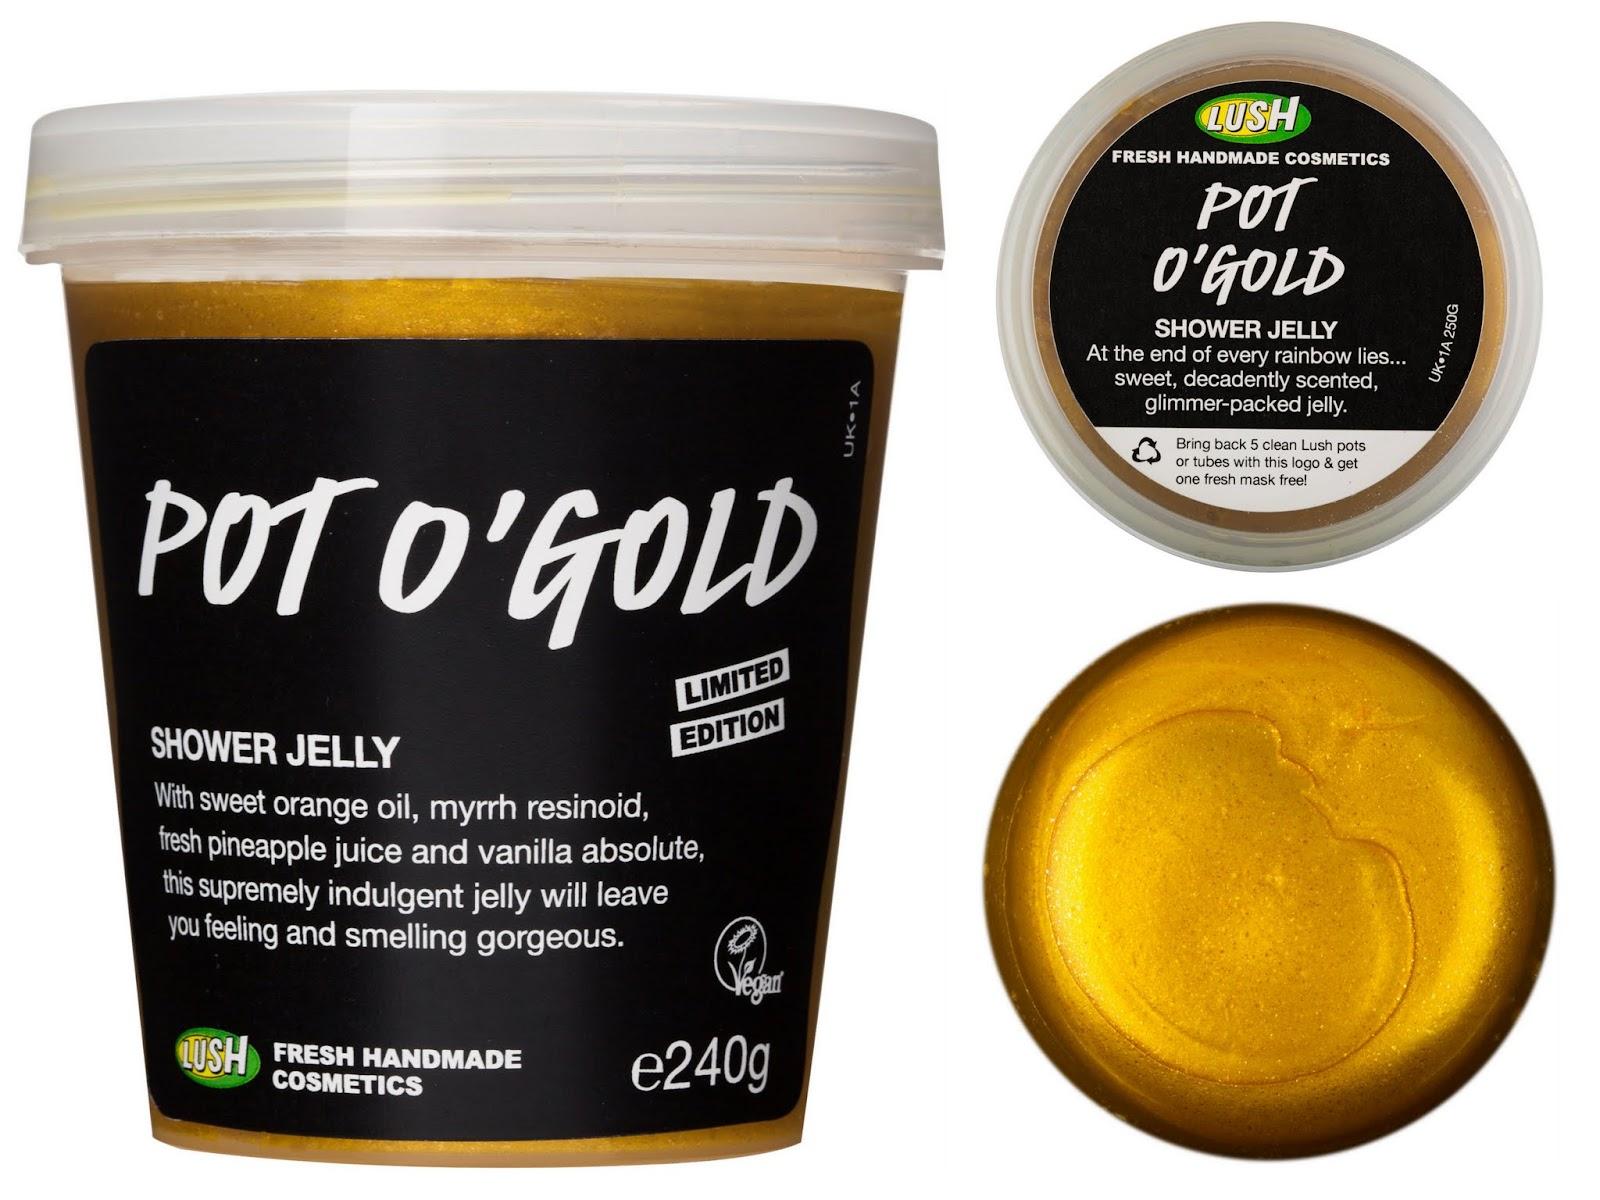 Lush Pot O'Gold Dusch Jelly Ostern 2015